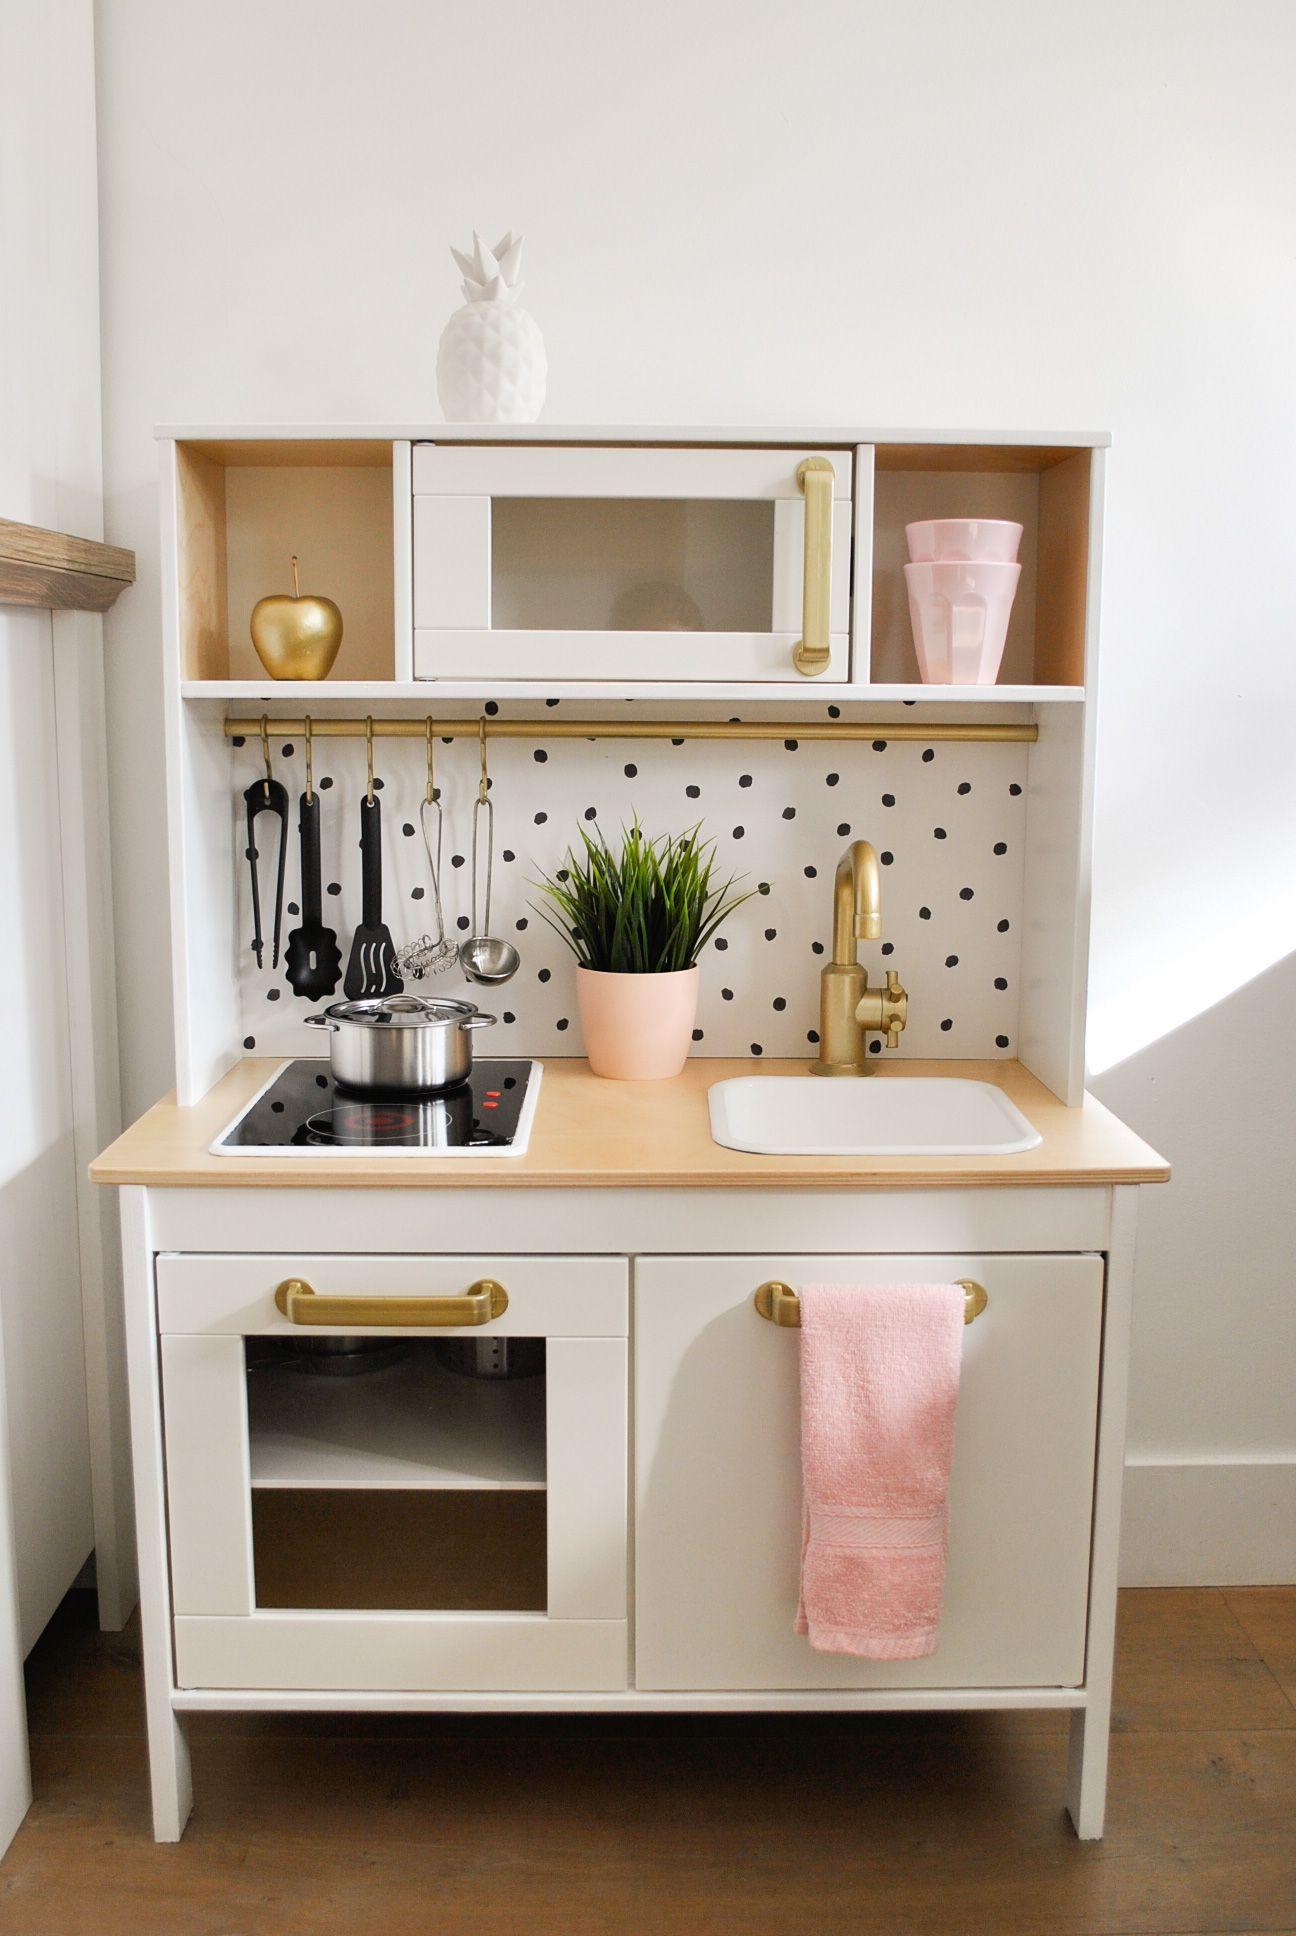 Ikea duktig kitchen #gardenplayhouse | Cucina per bambini ...